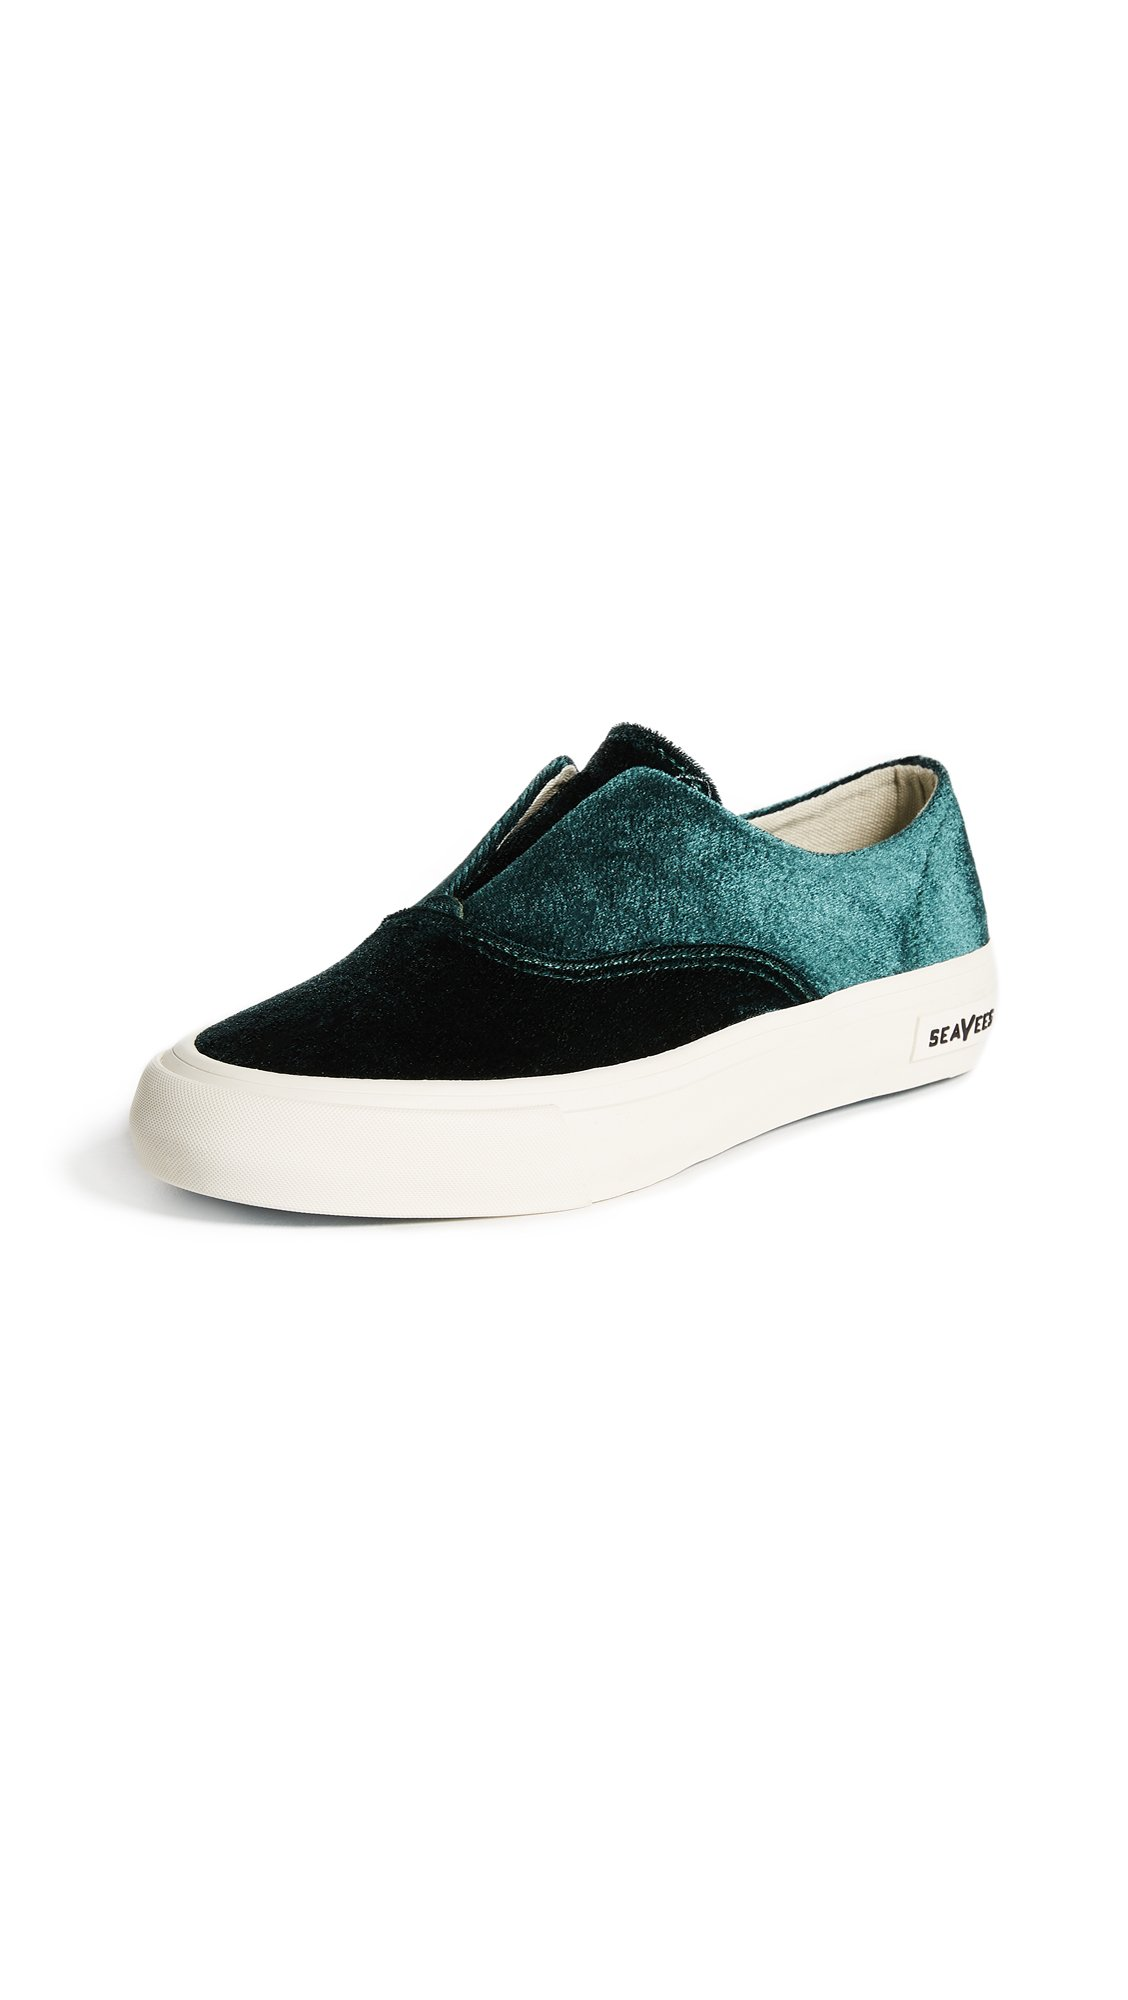 SeaVees Women's Sunset Strip Sneakers, Dark Eden, 11 B(M) US